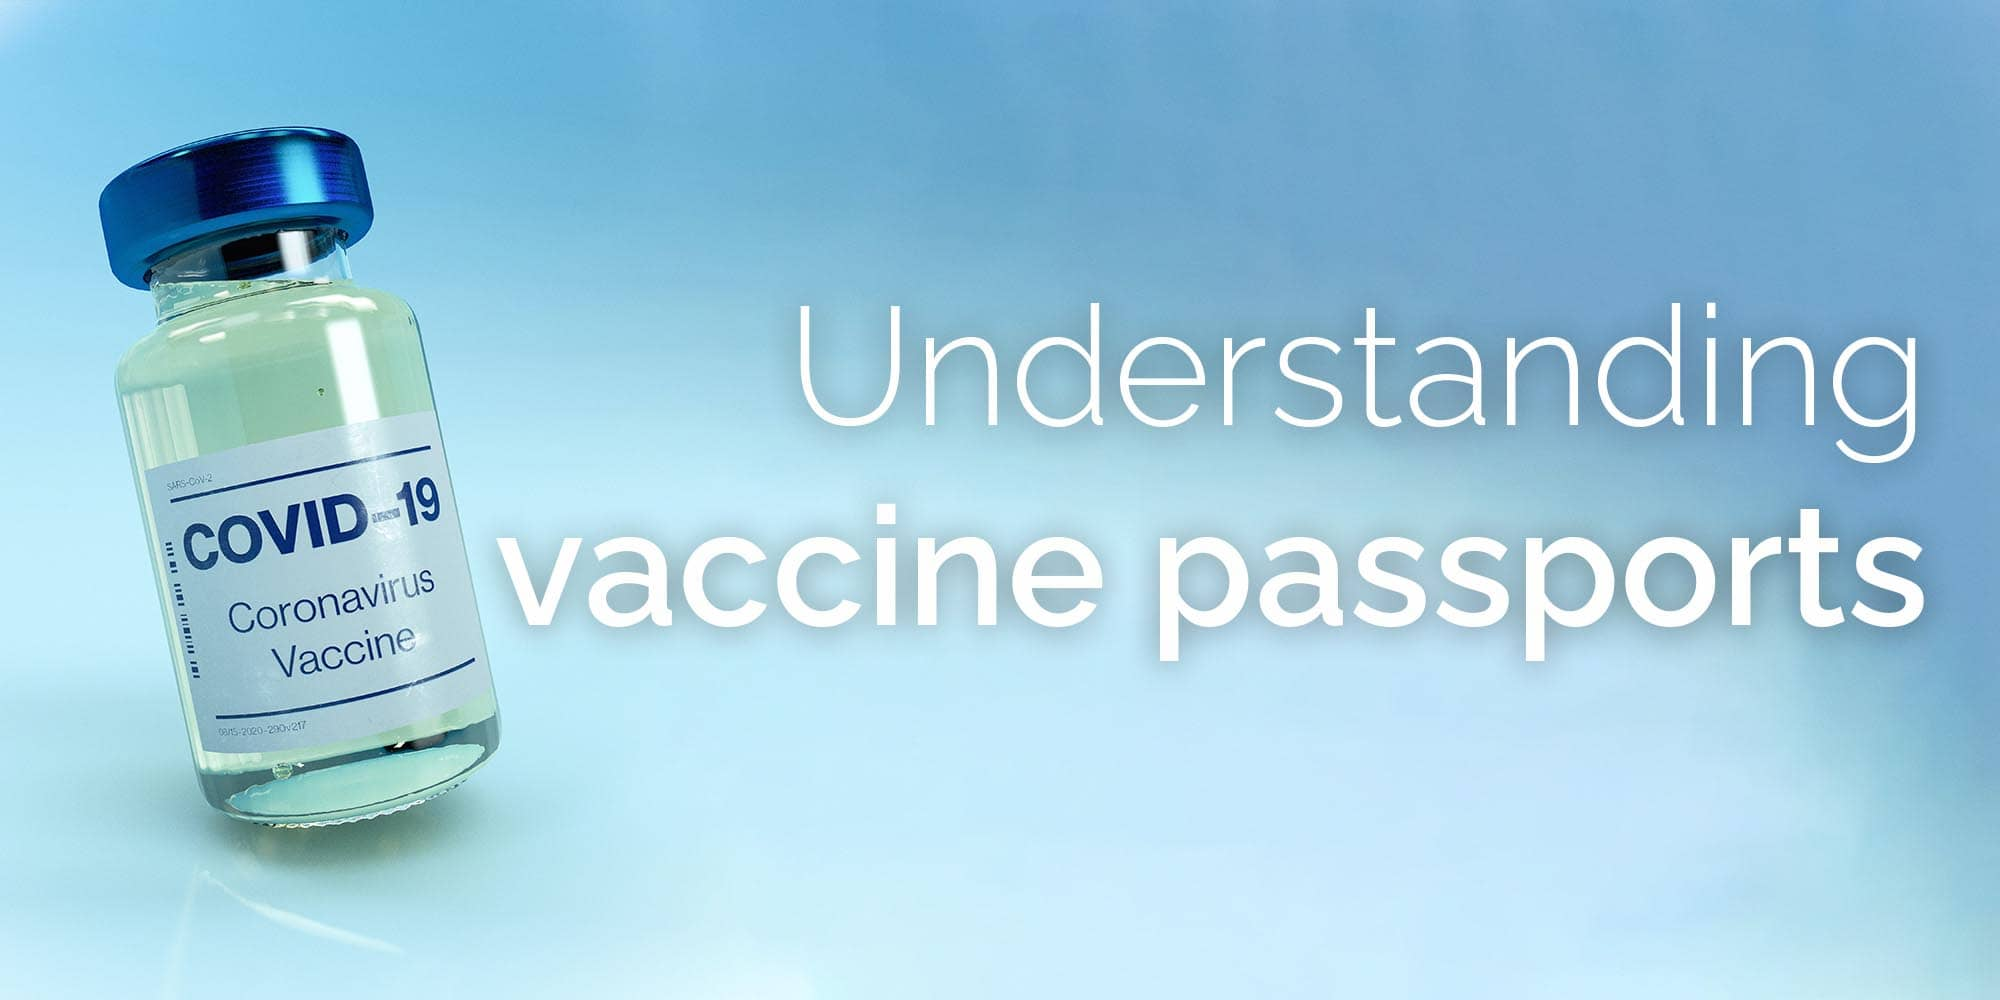 covid-19 vaccine passport